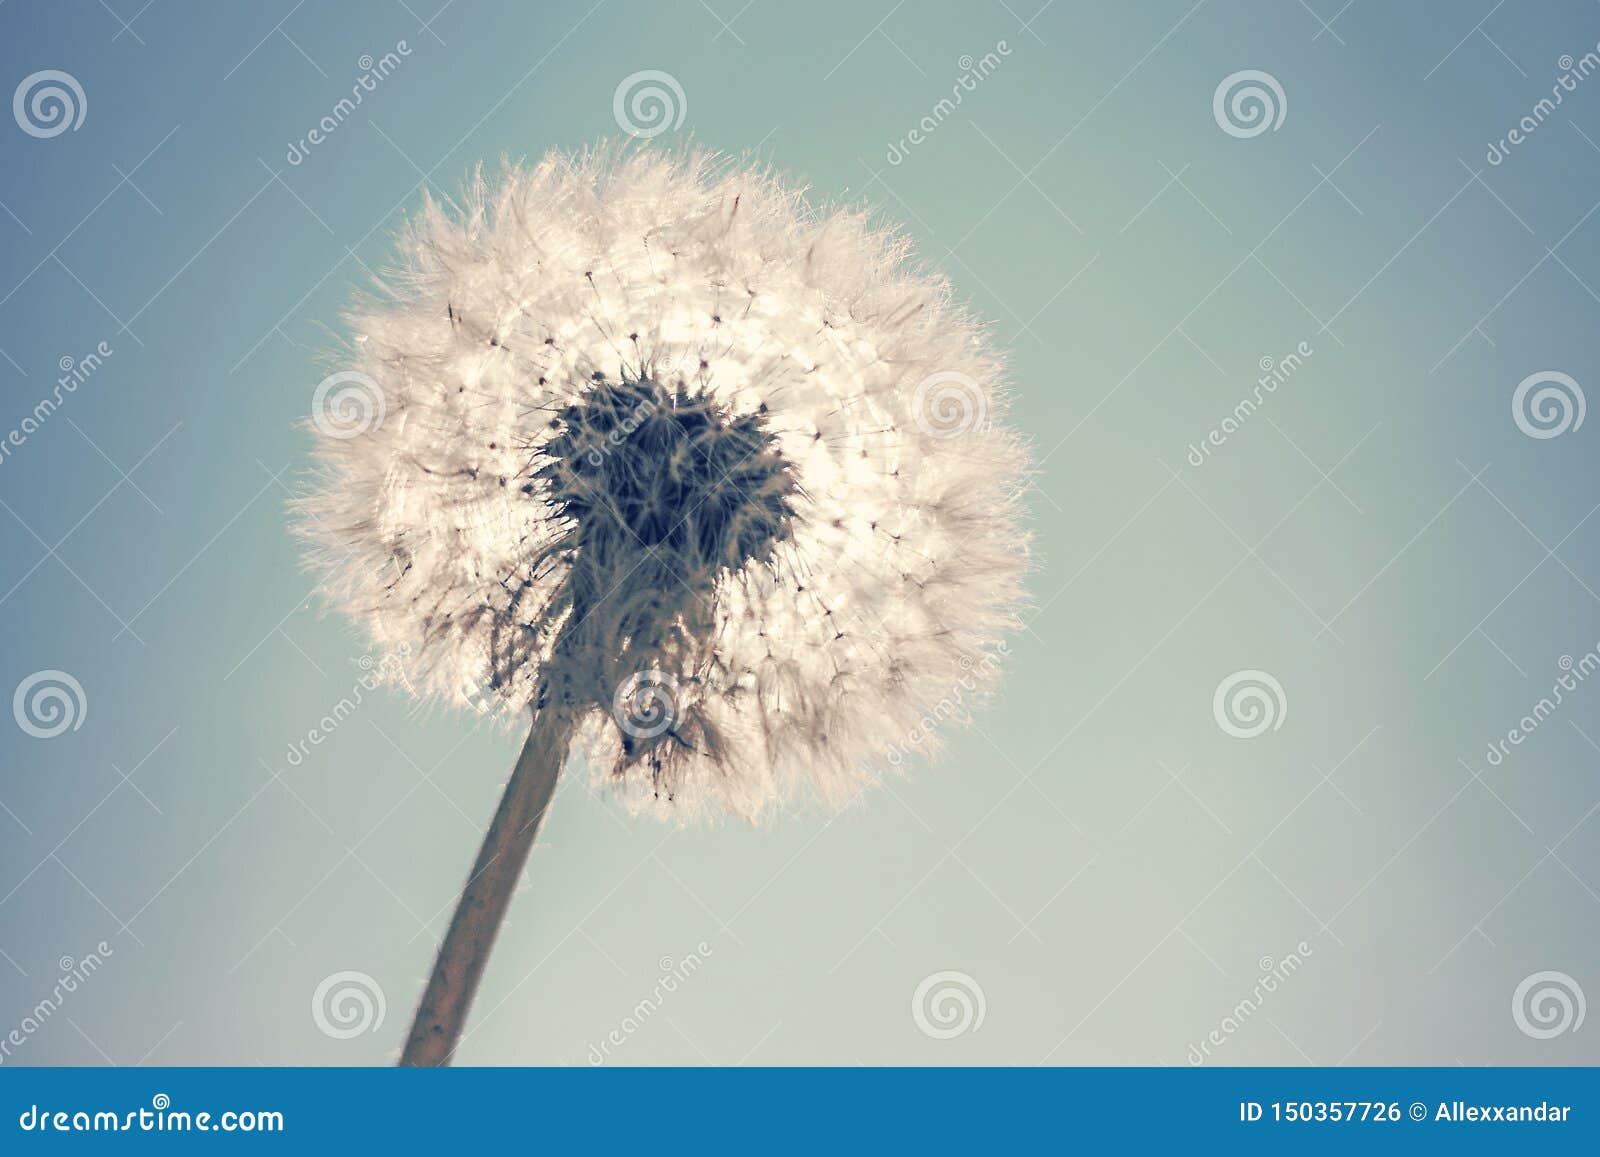 Dandelion Sun and Blue Sky background, Close Up Dandelion